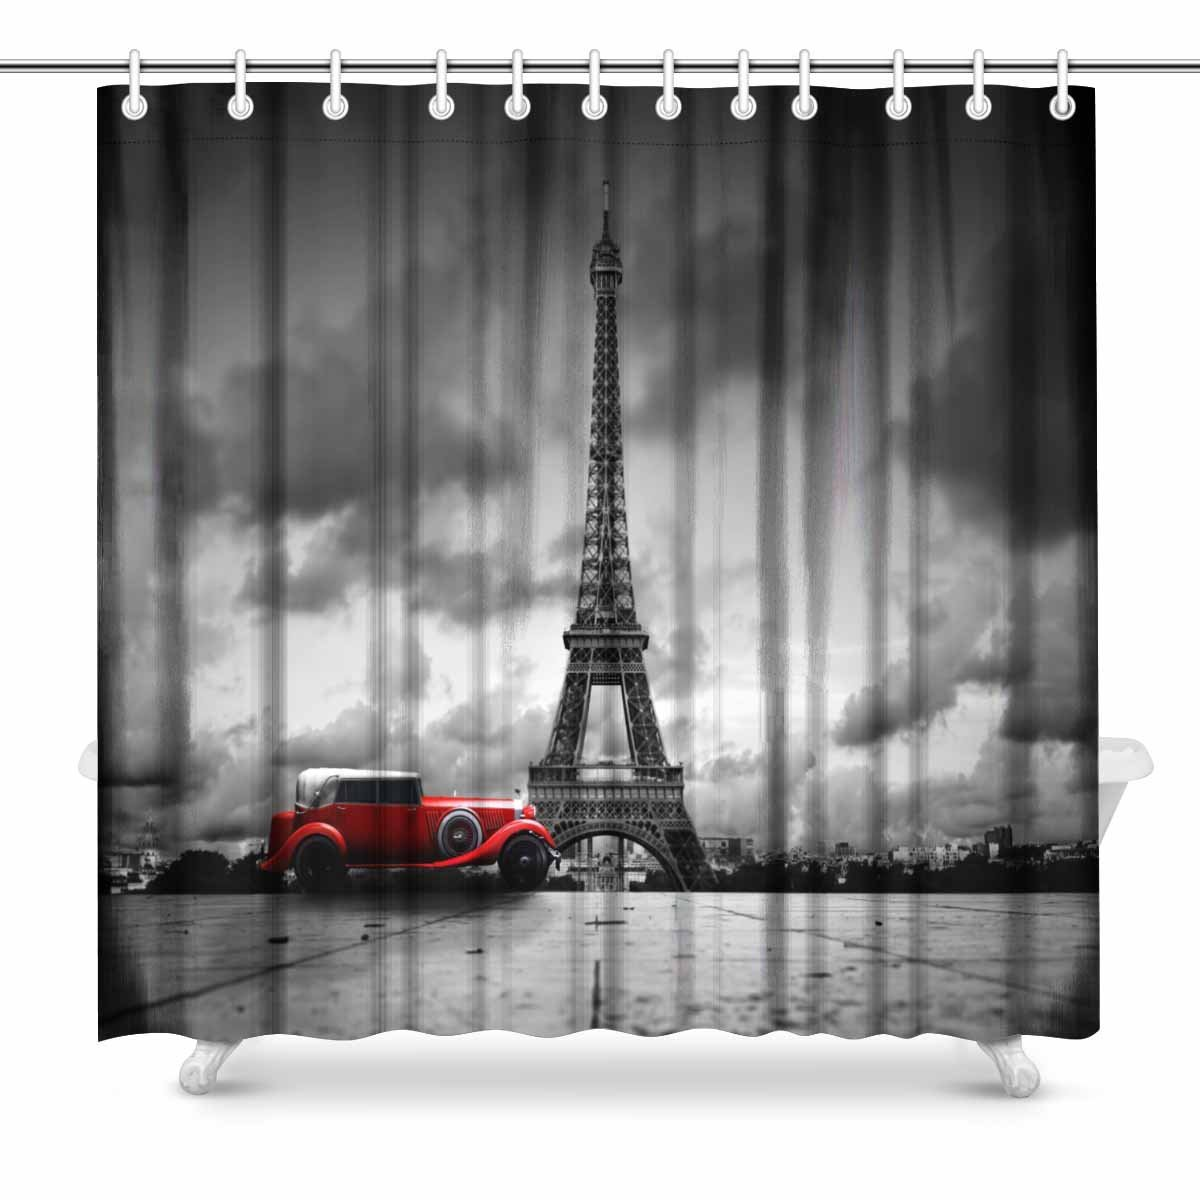 Aplysia Effel Toren Parijs Frankrijk En Rode Retro Auto Zwart-wit Vintage Badkamer Accessoires Douche Gordijnen